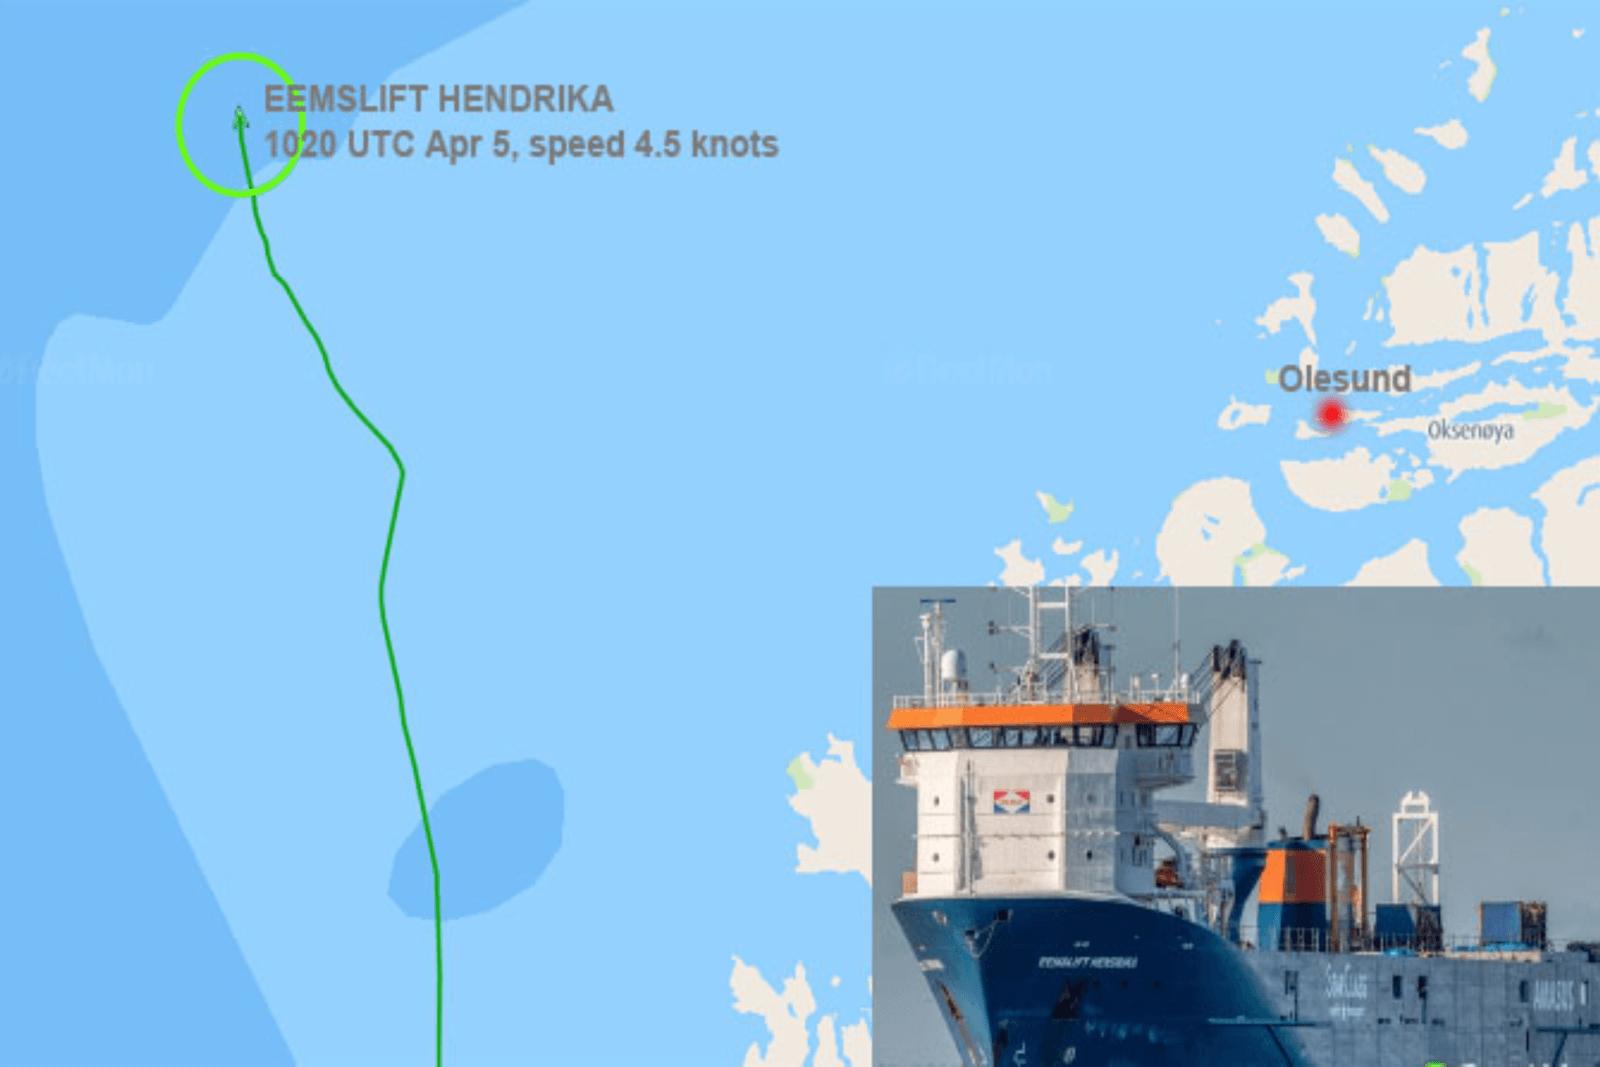 Dutch cargo ship in danger of capsizing, crew partially evacuated, Norwegian sea